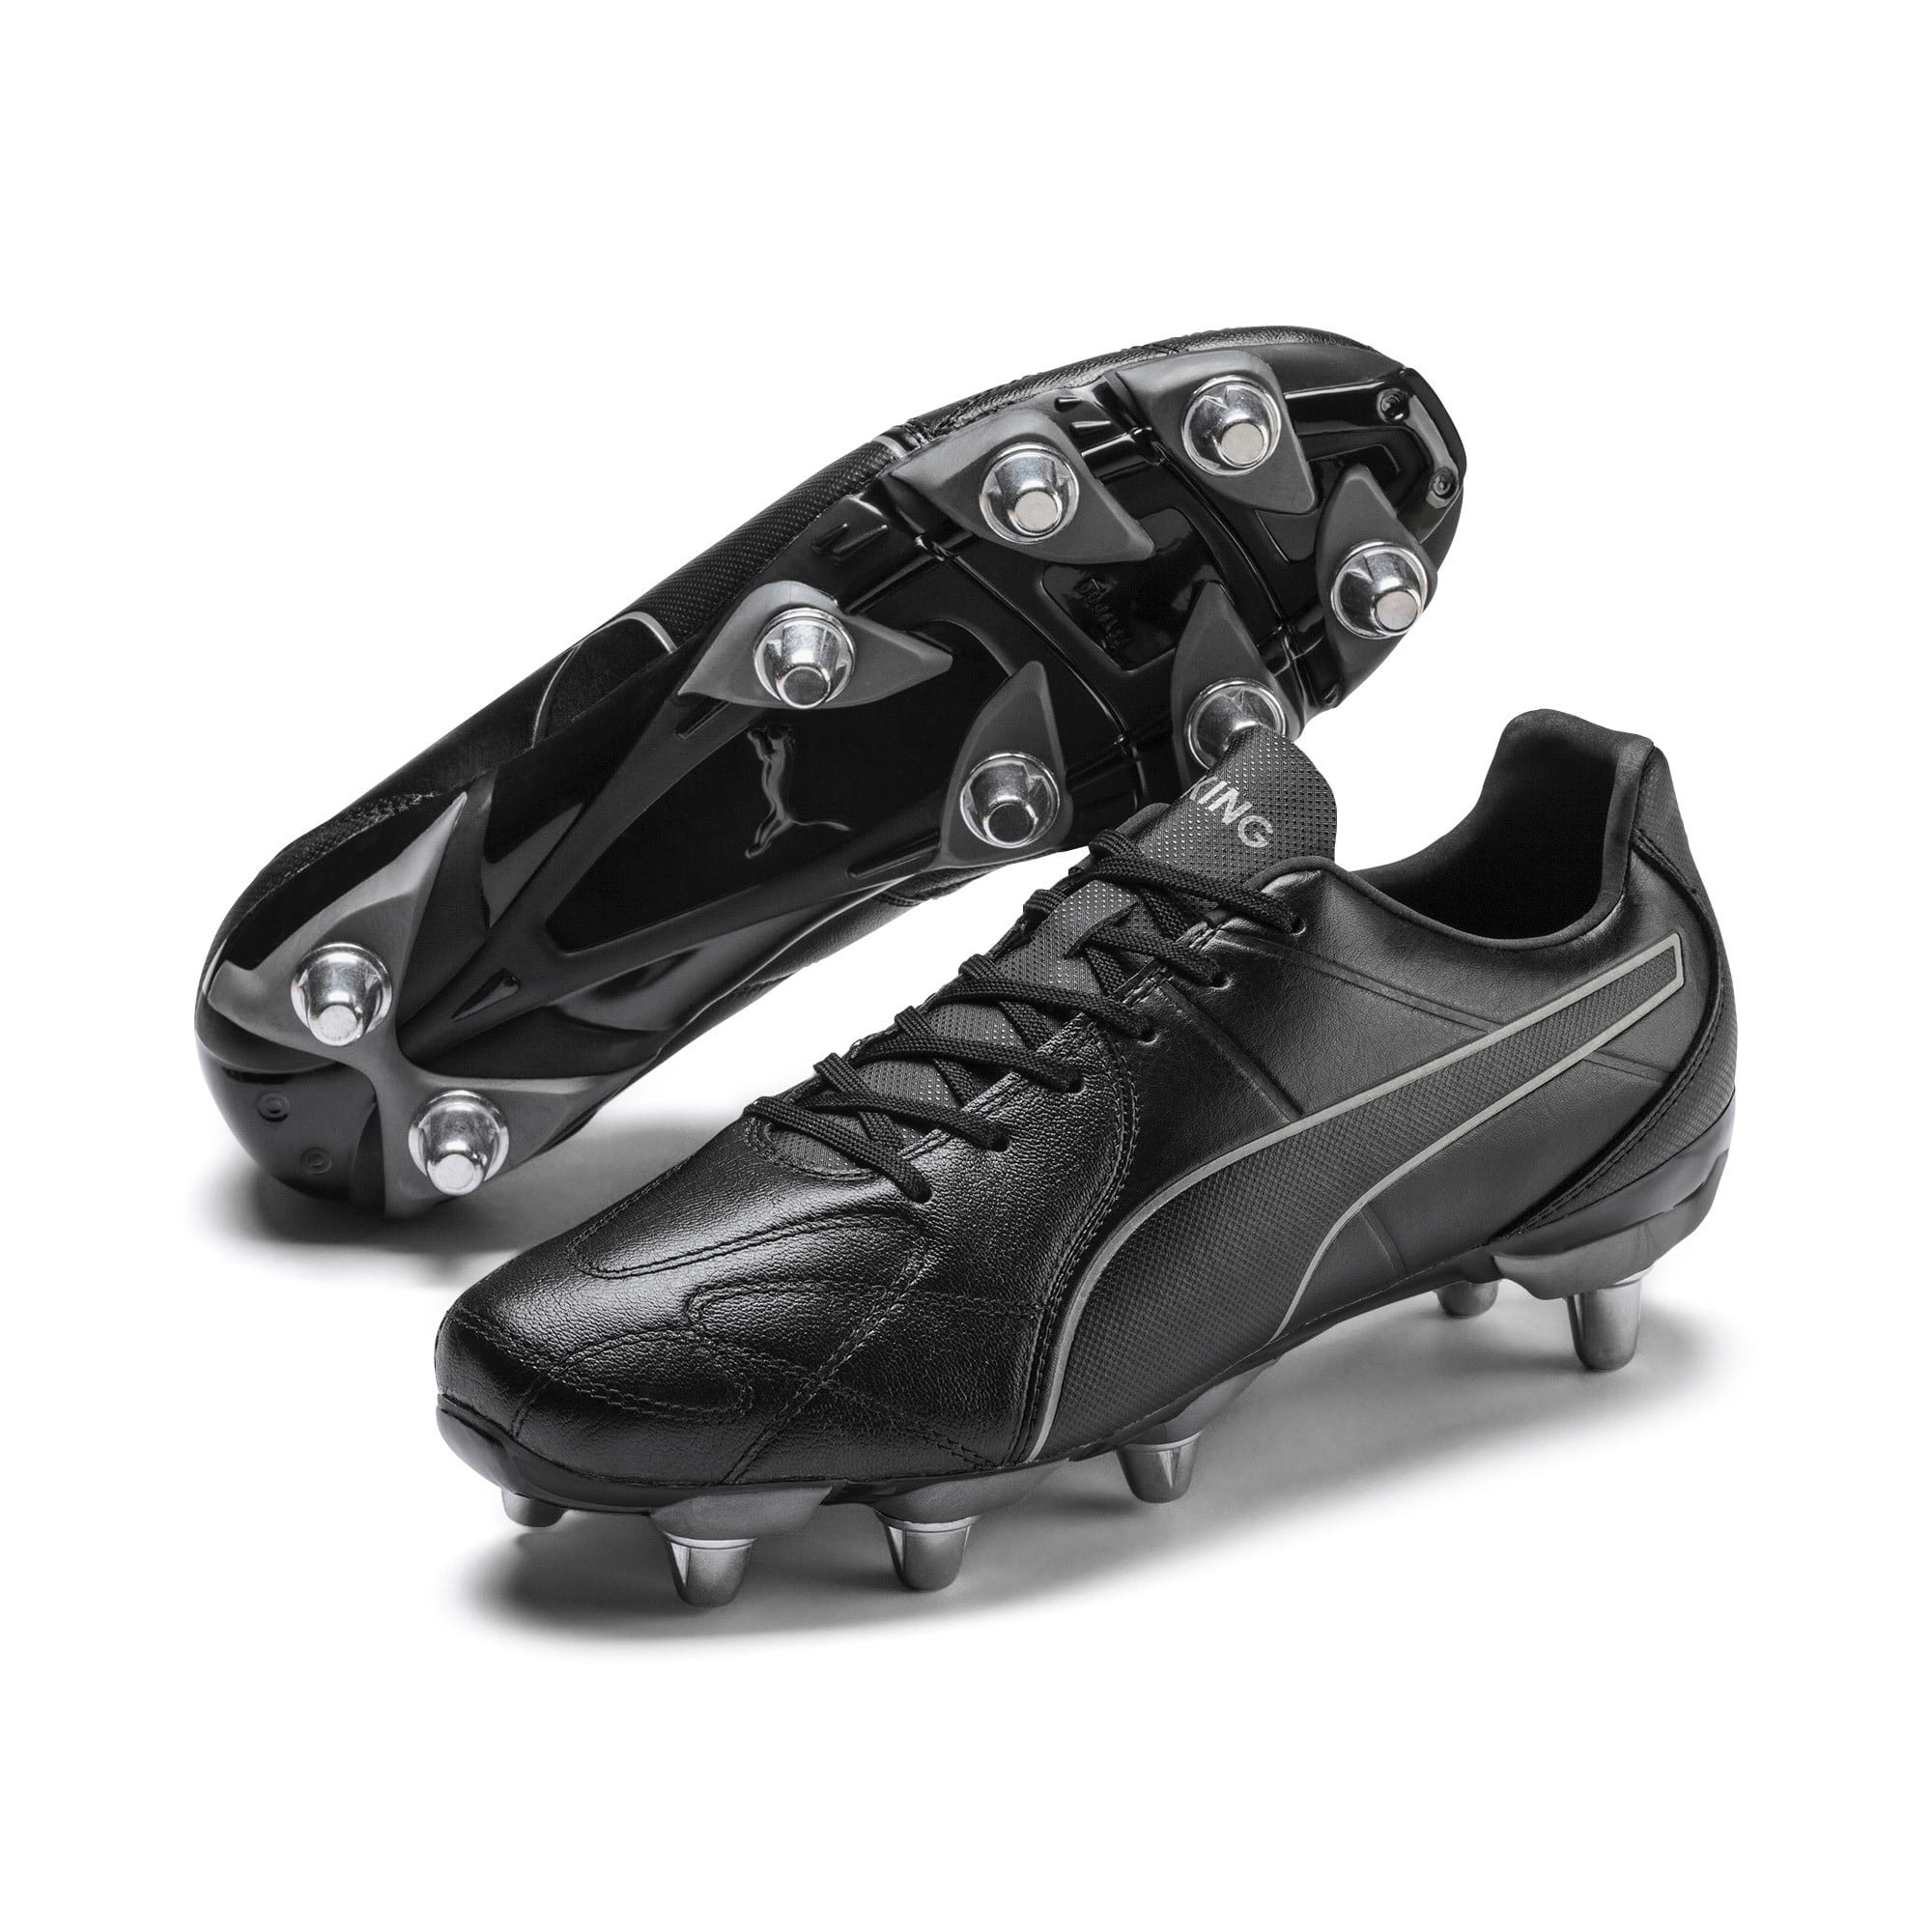 Thumbnail 2 of KING Hero H8 Men's Rugby Boots, Puma Black-Puma Aged Silver, medium